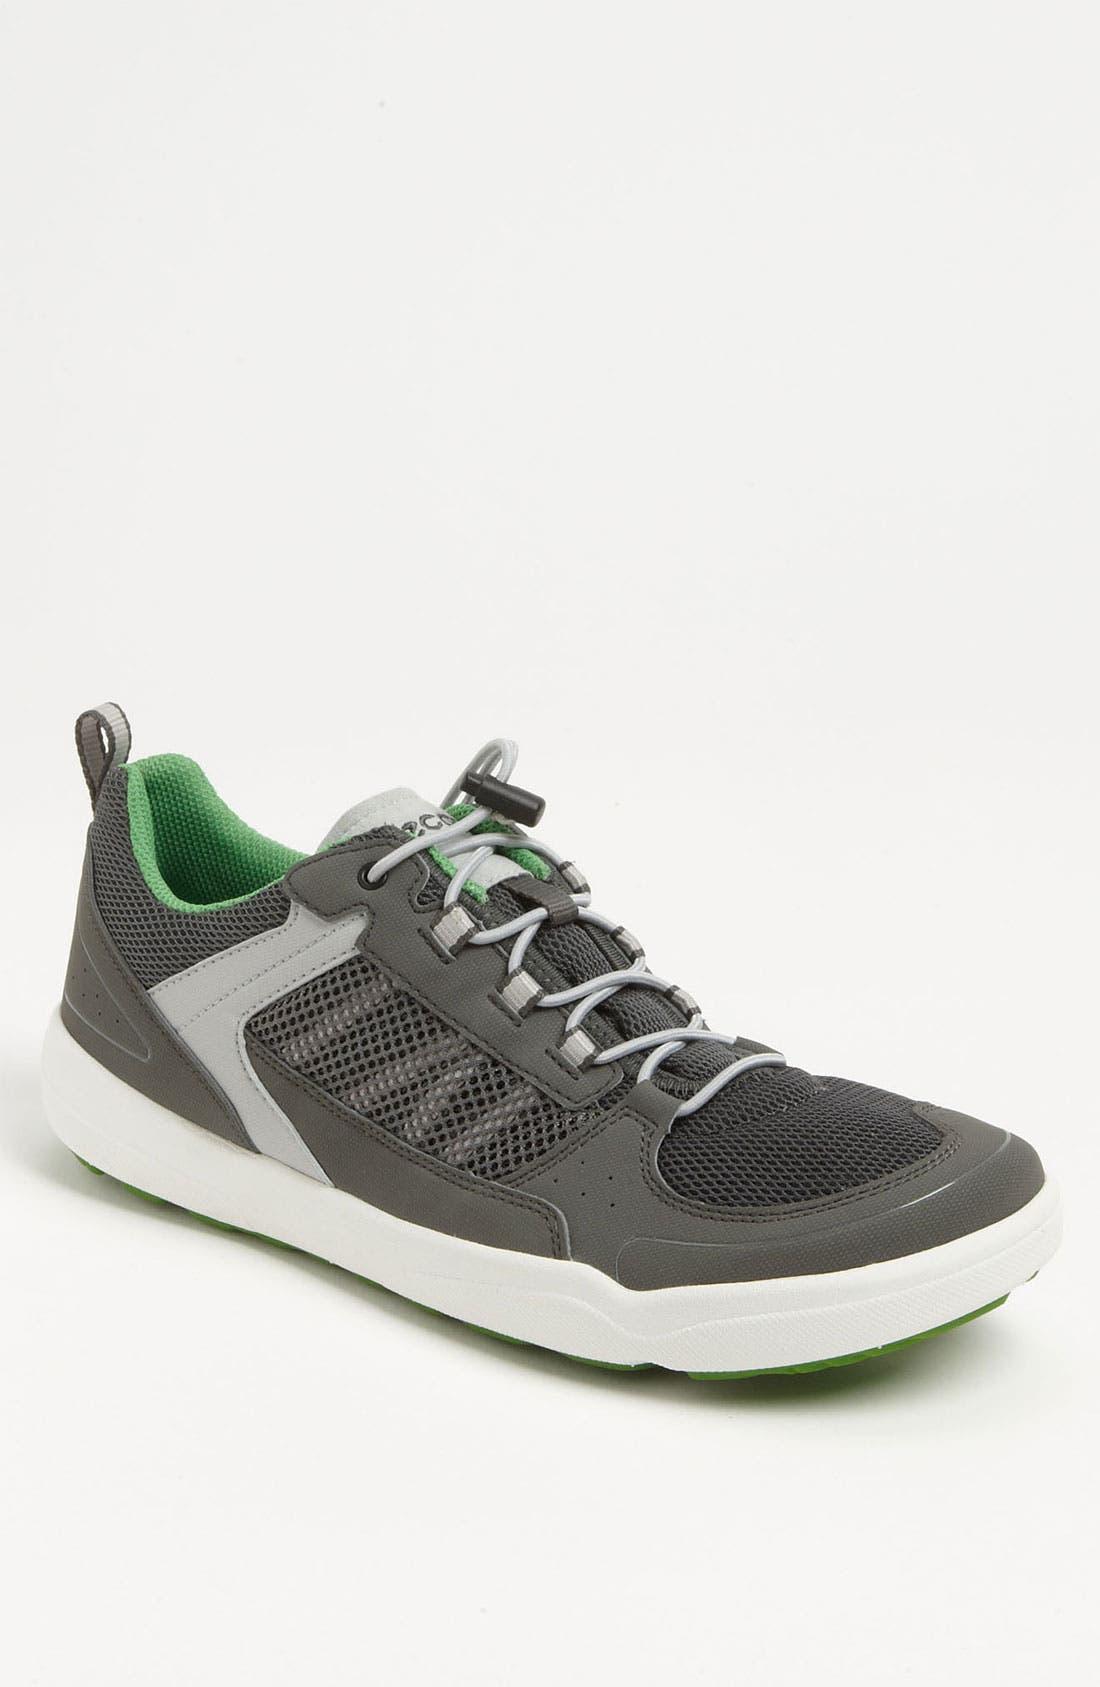 Alternate Image 1 Selected - ECCO 'Njord' Sneaker